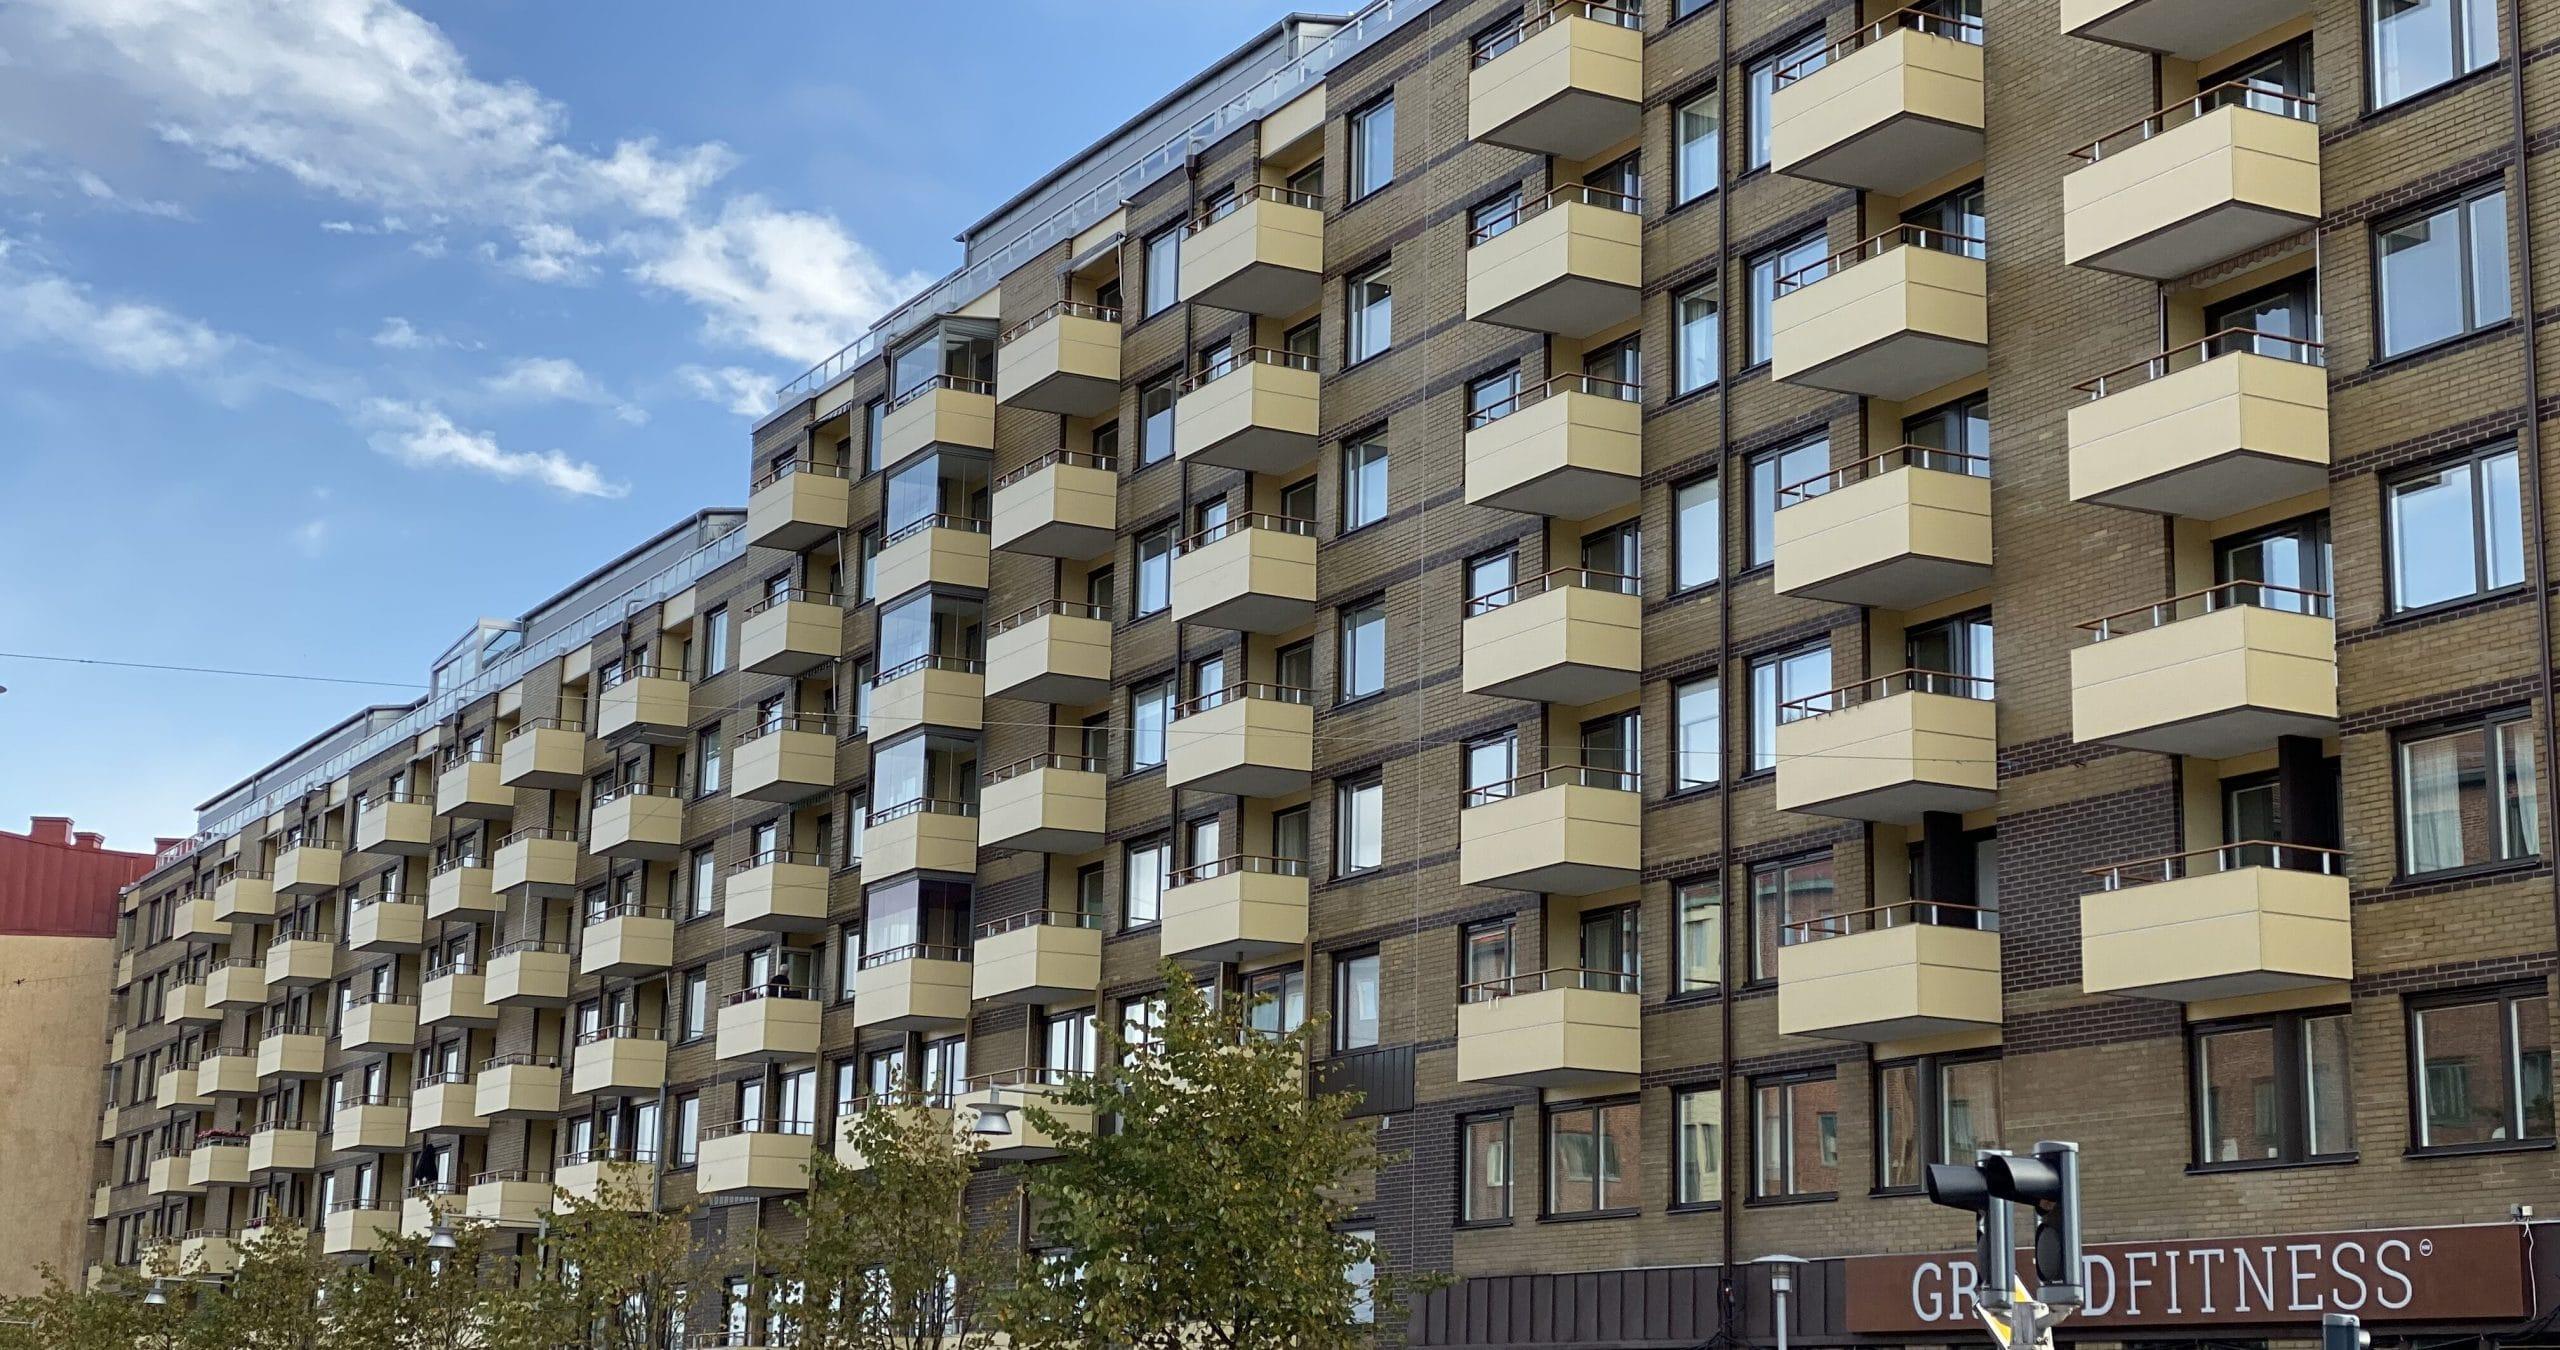 lägenhetshus med balkonger på skanstorget i göteborg